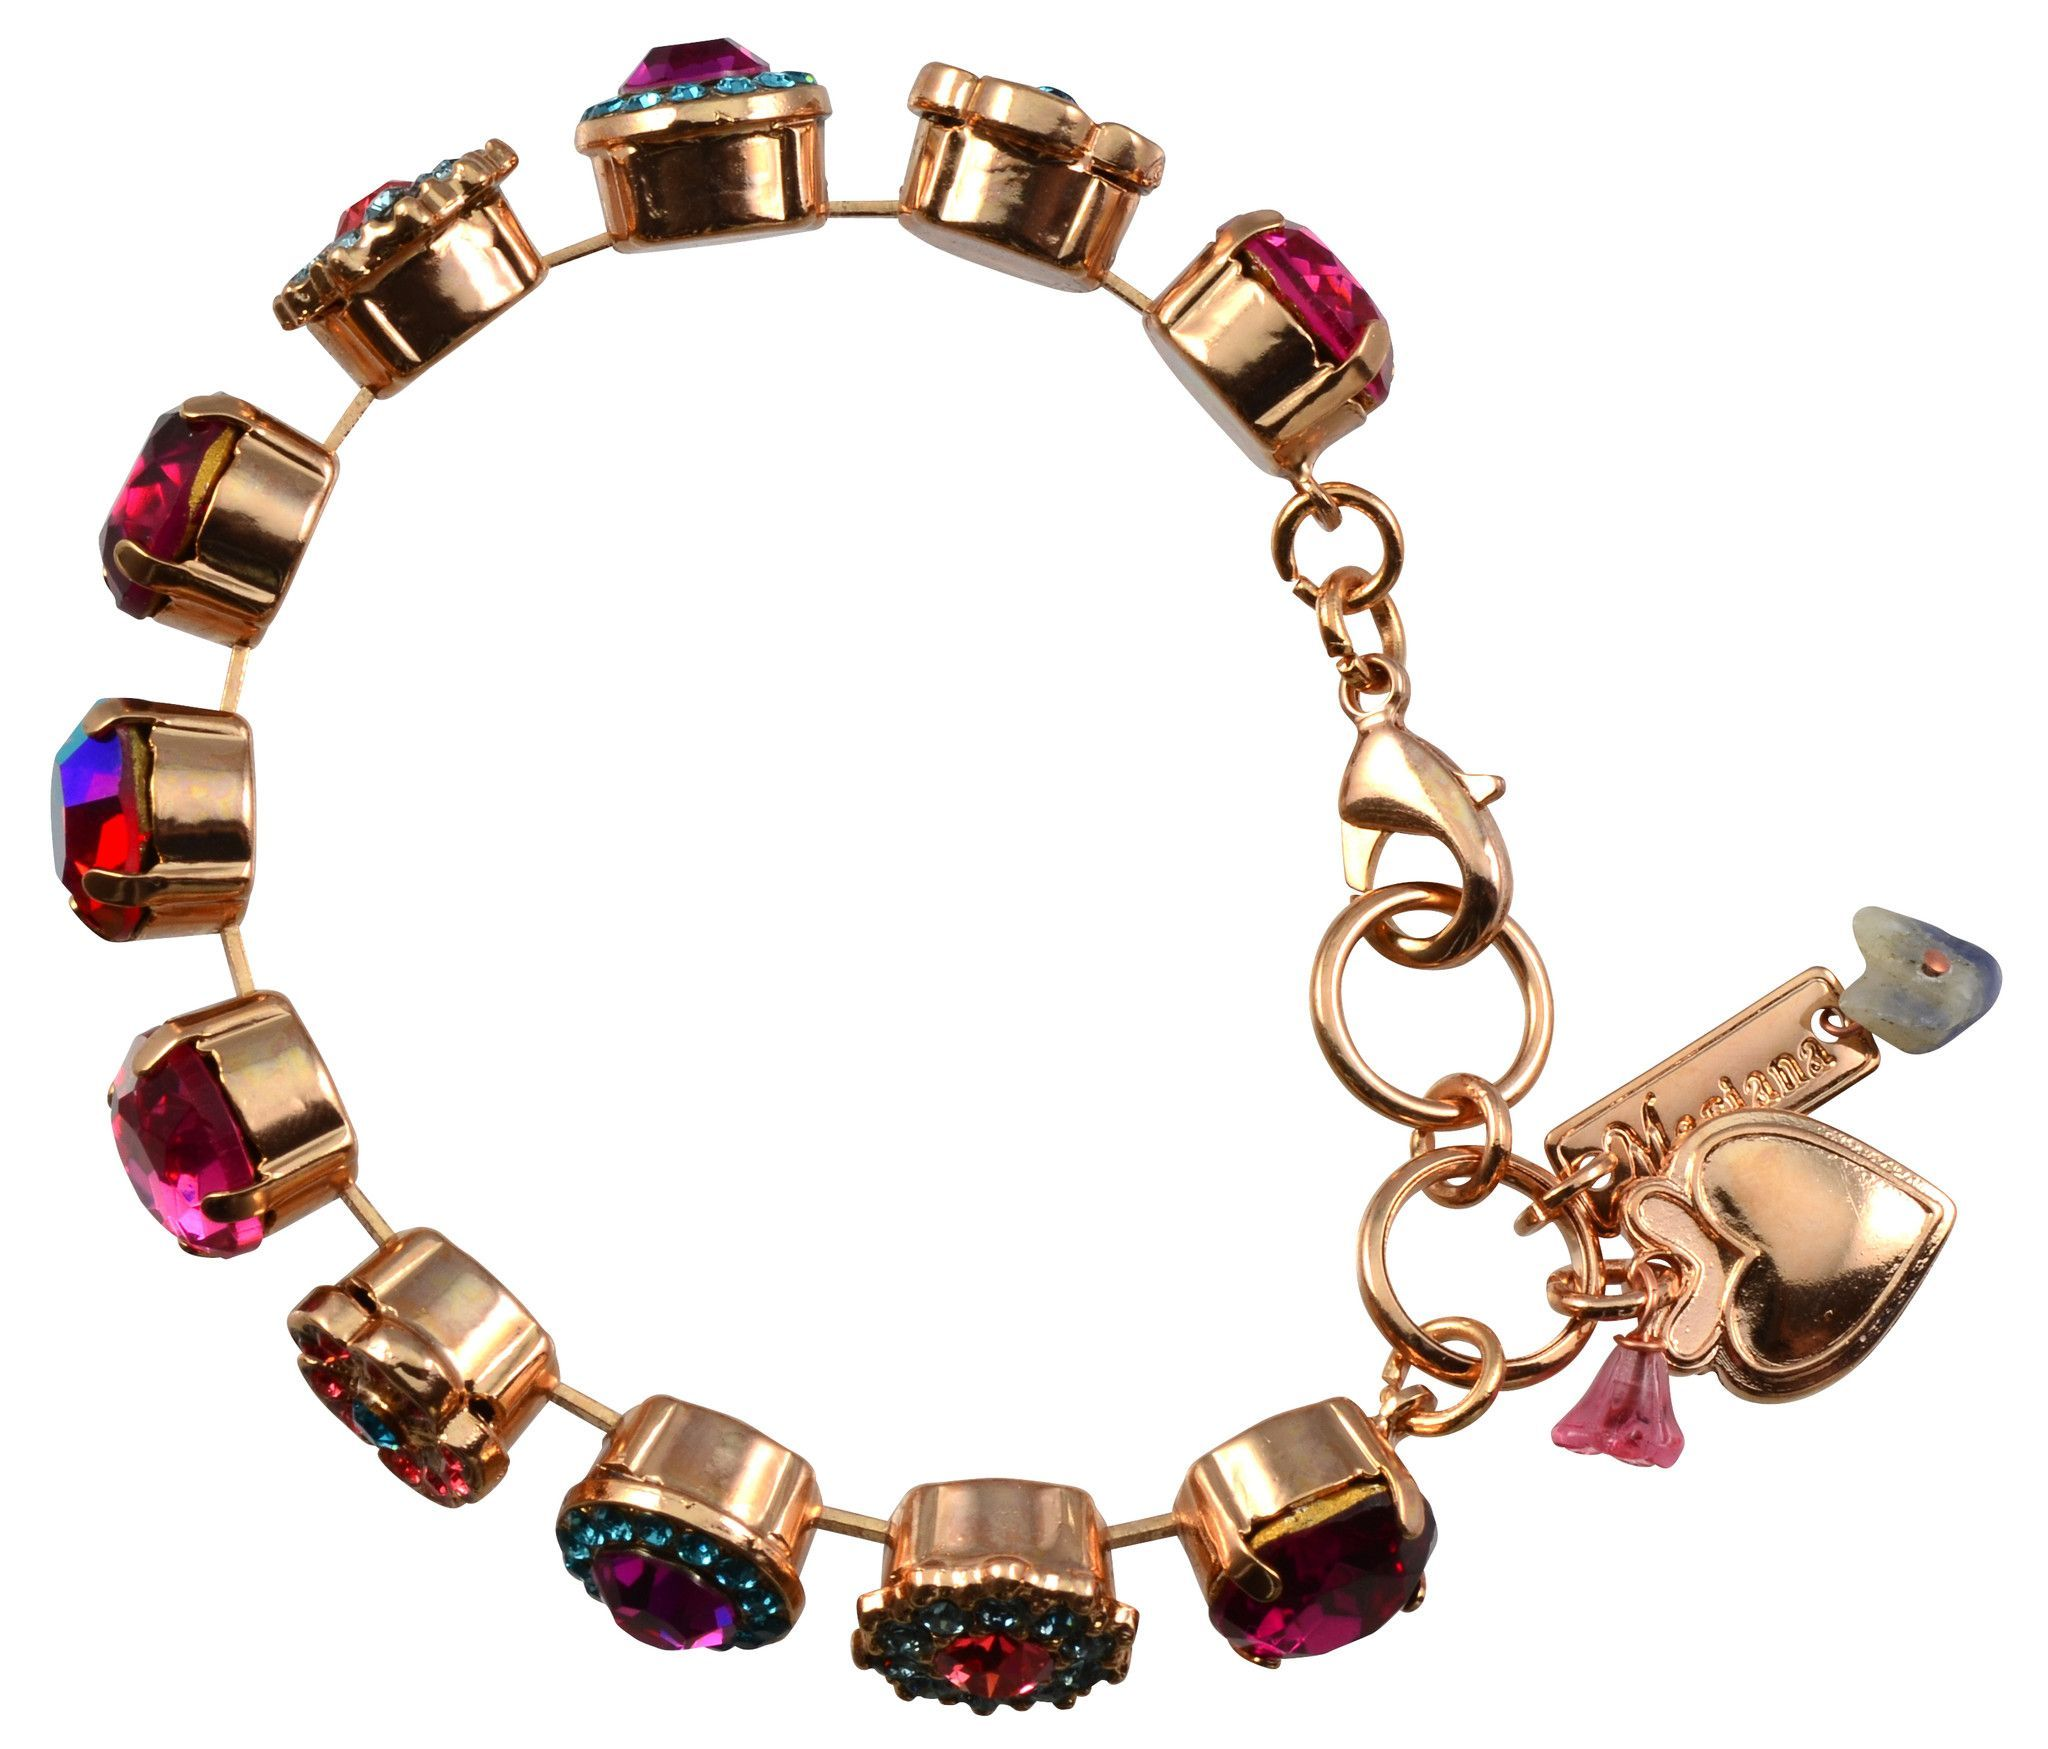 Mariana sorbet rose gold plated swarovski crystal large gem tennis